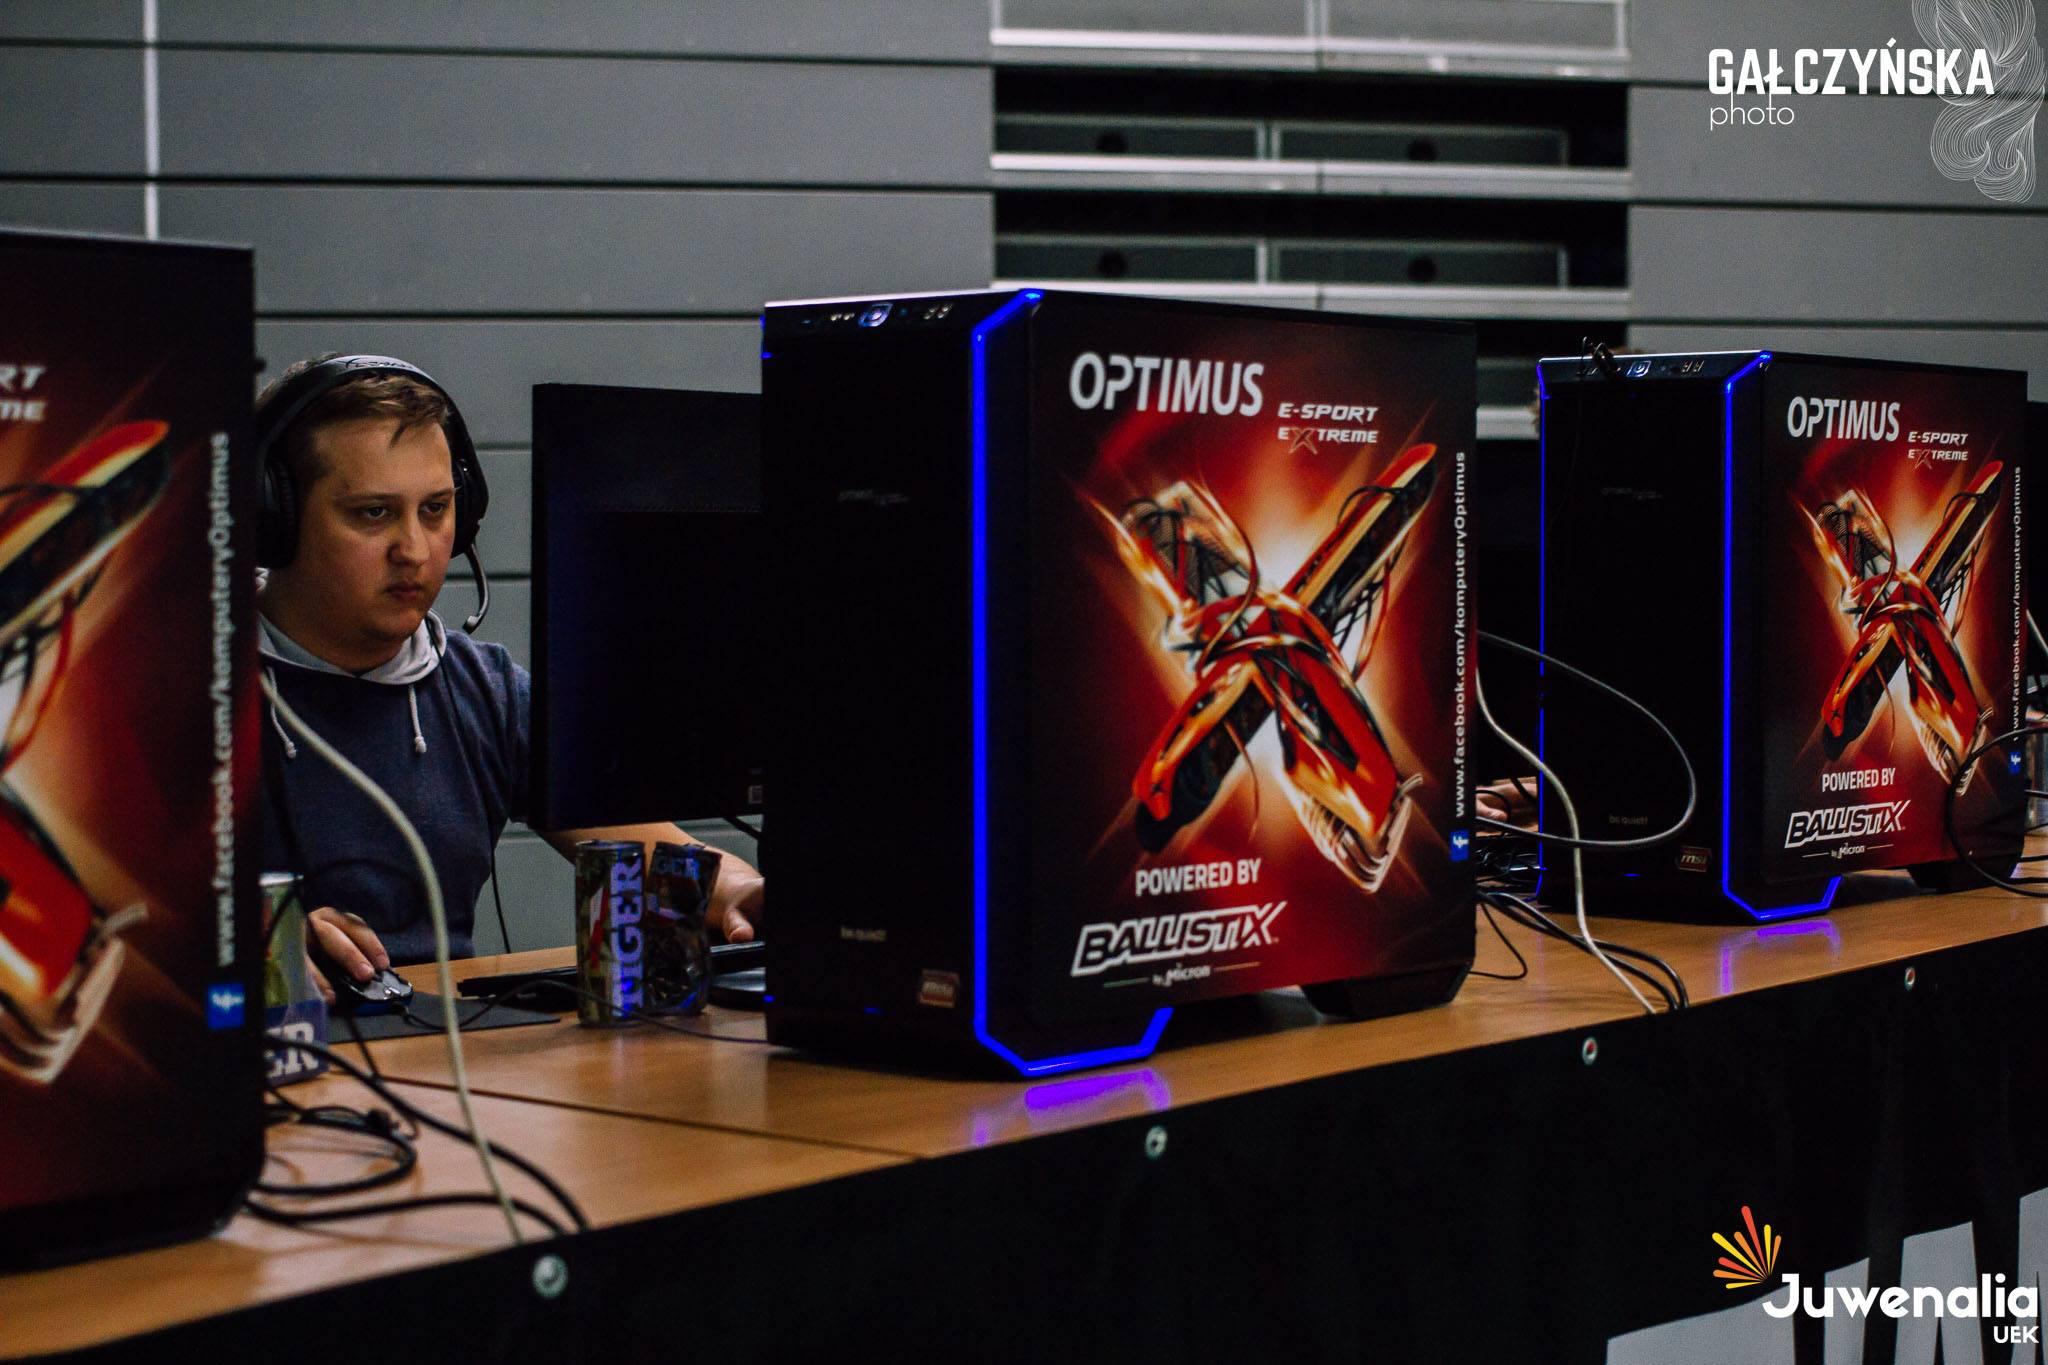 Galczynska Uek Gaming Stage